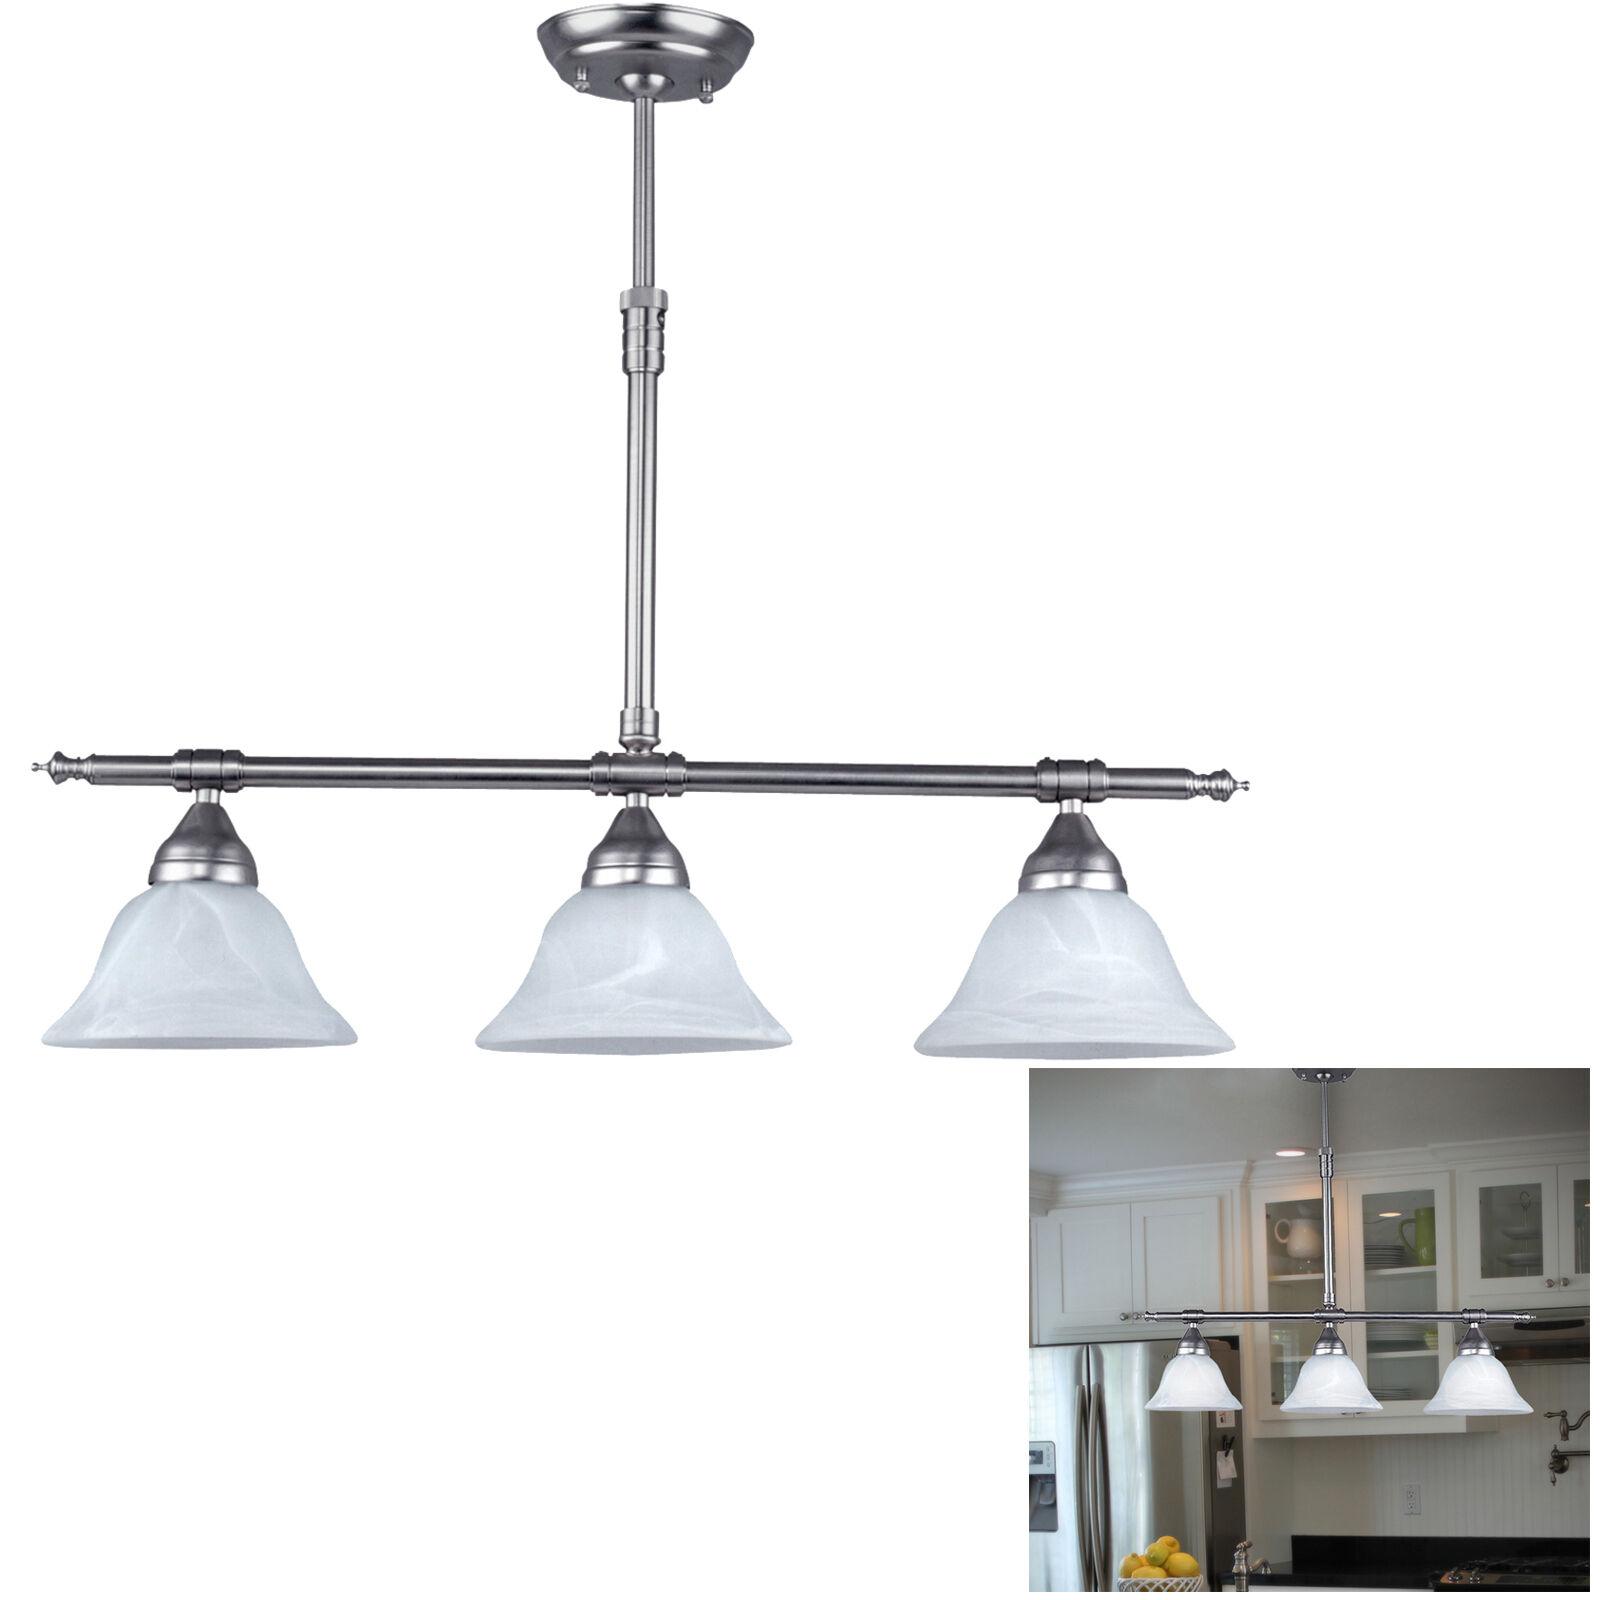 Brushed Nickel Kitchen Island Pendant Light Fixture Dining, 3 Globe Bar Lighting Chandeliers & Ceiling Fixtures